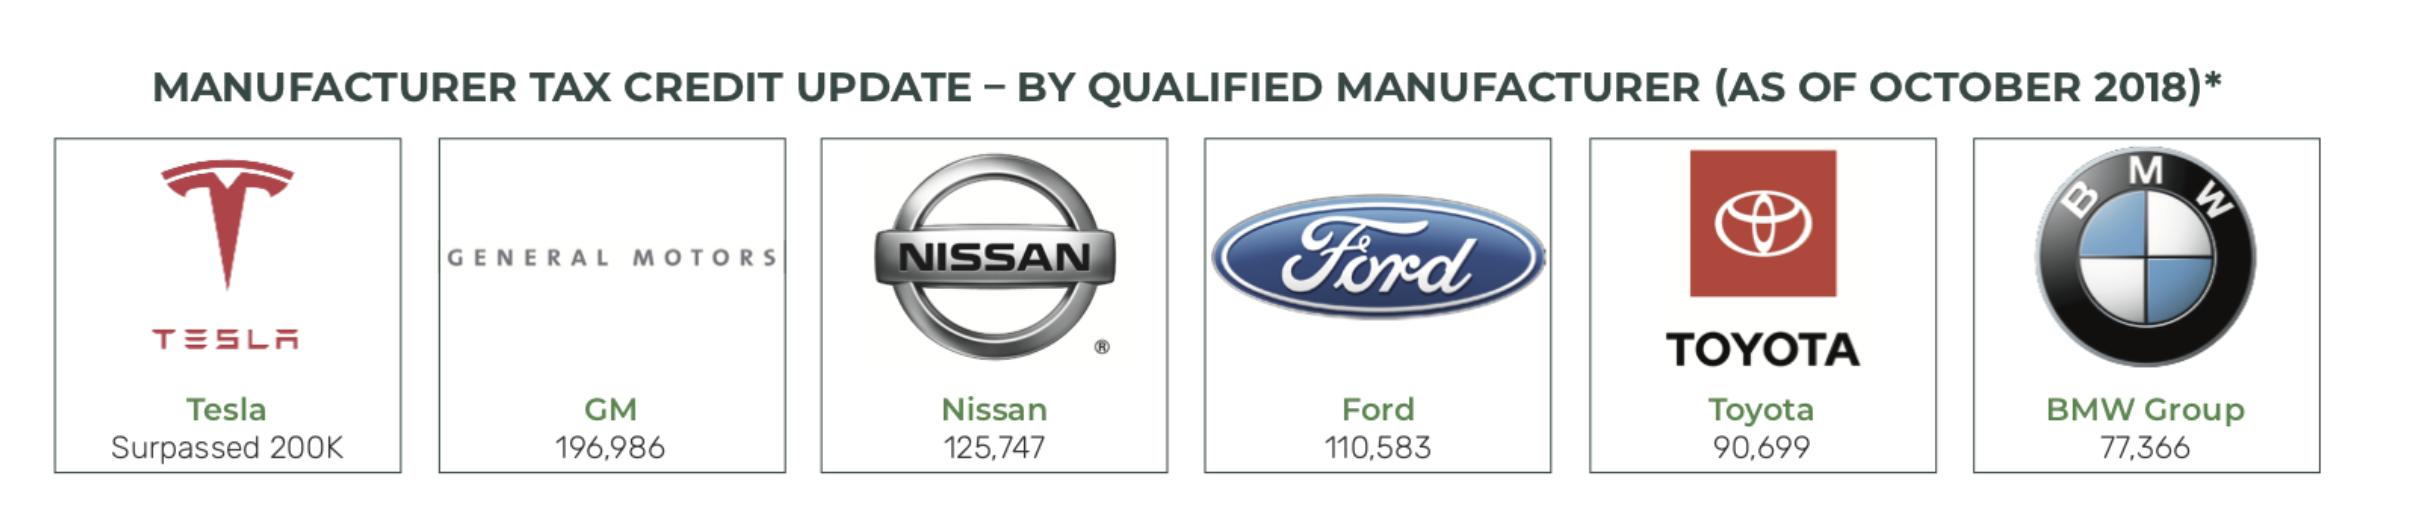 Tesla GM electric vehicle tax credit